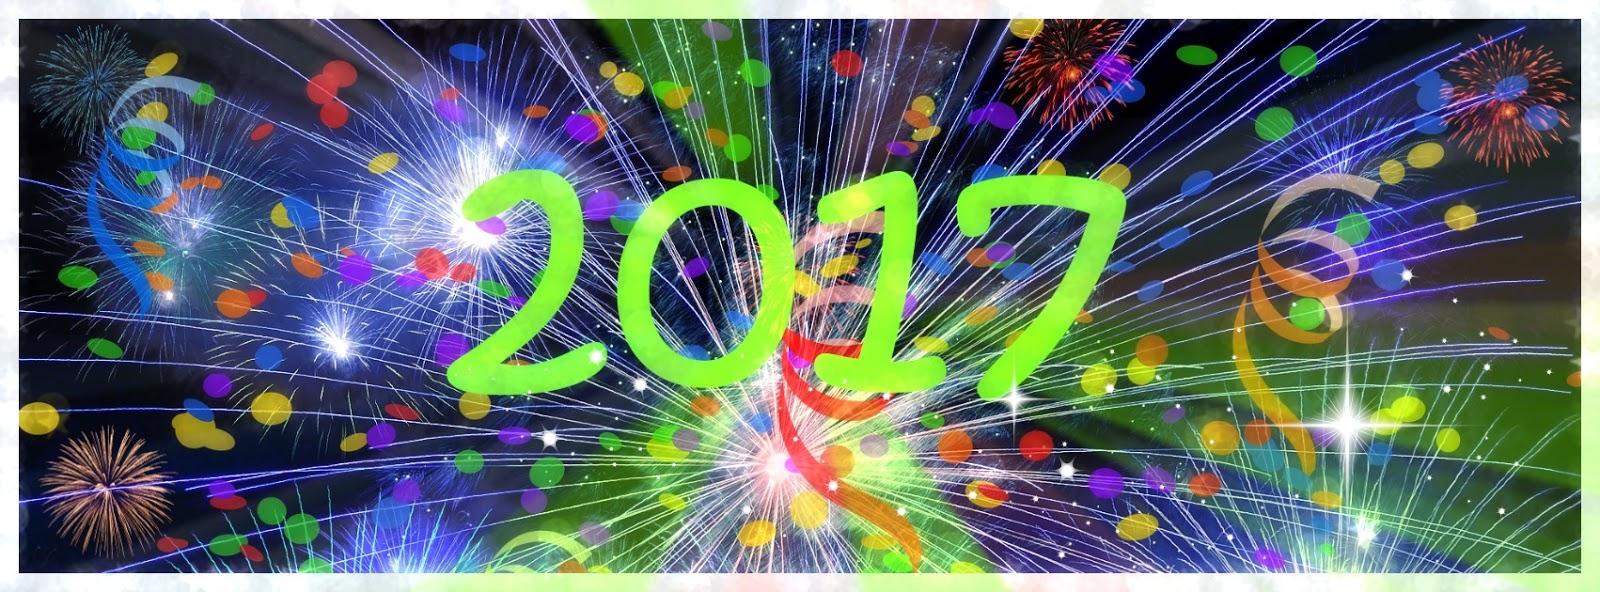 JoJoFun Kids Party Entertainers in London: 5 New Year's ...